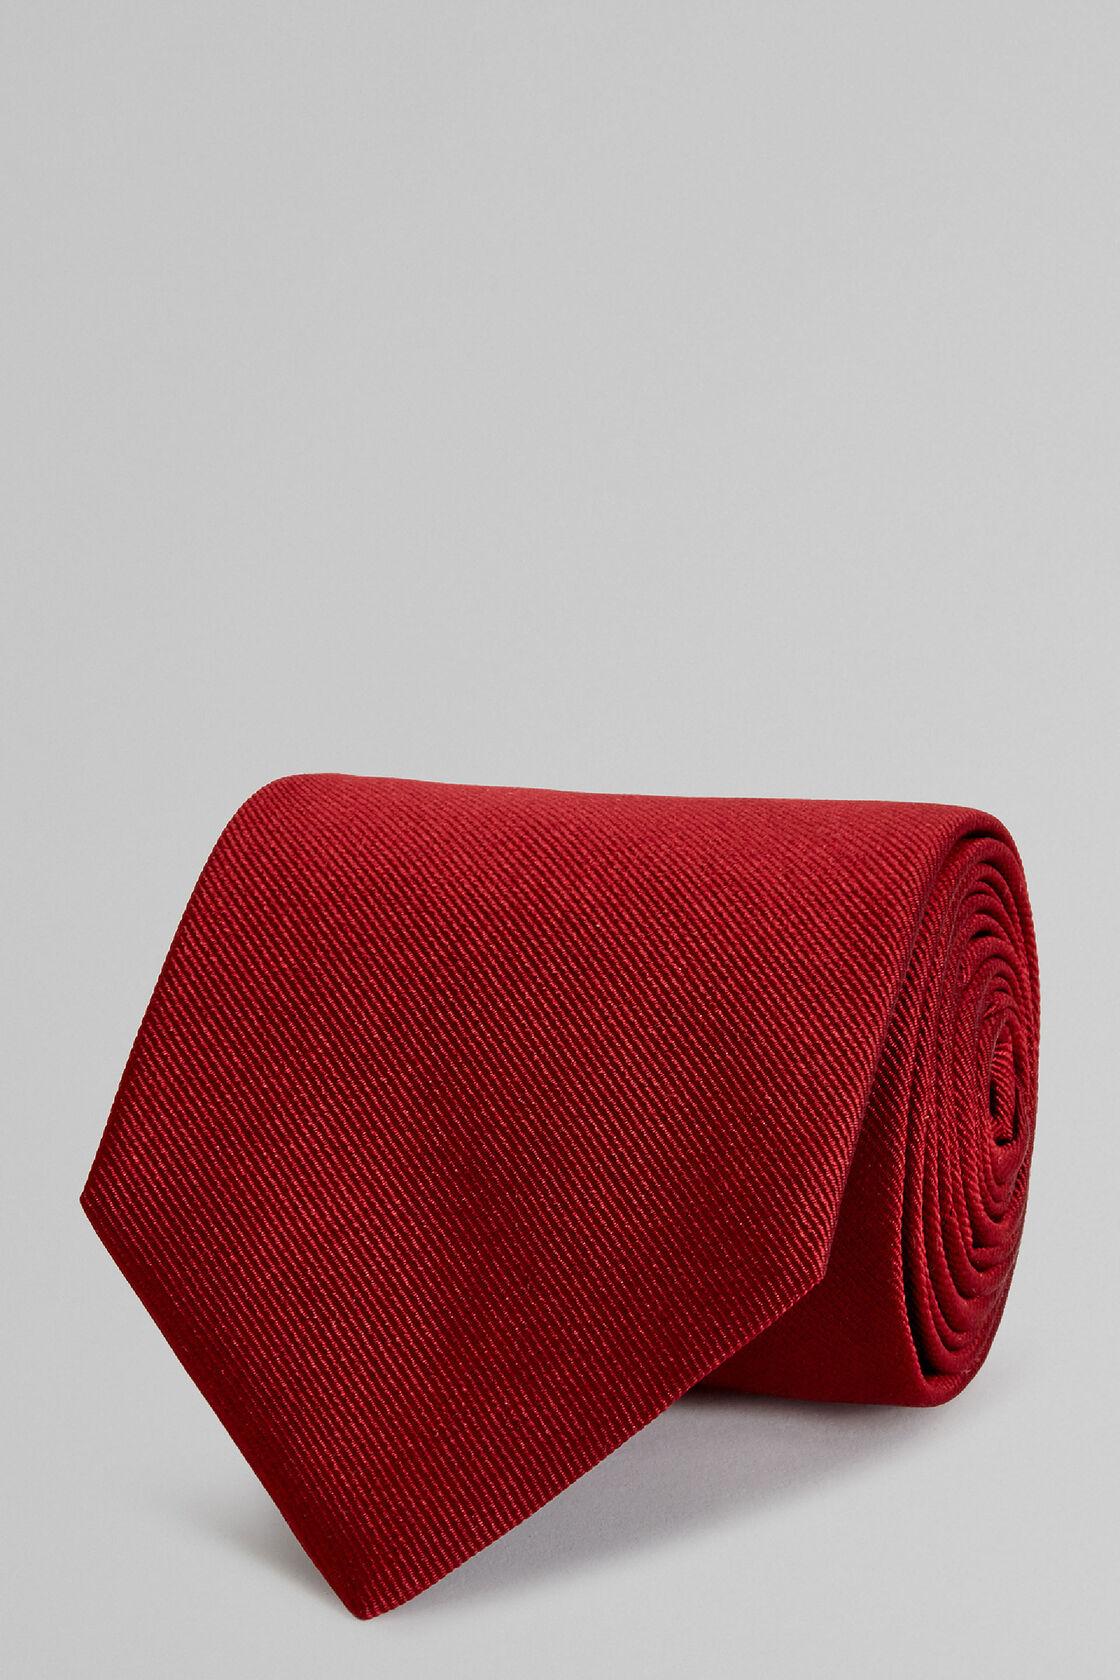 Einfarbige Krawatte Aus Seidenjacquard Bordeaux, Burgund, hi-res